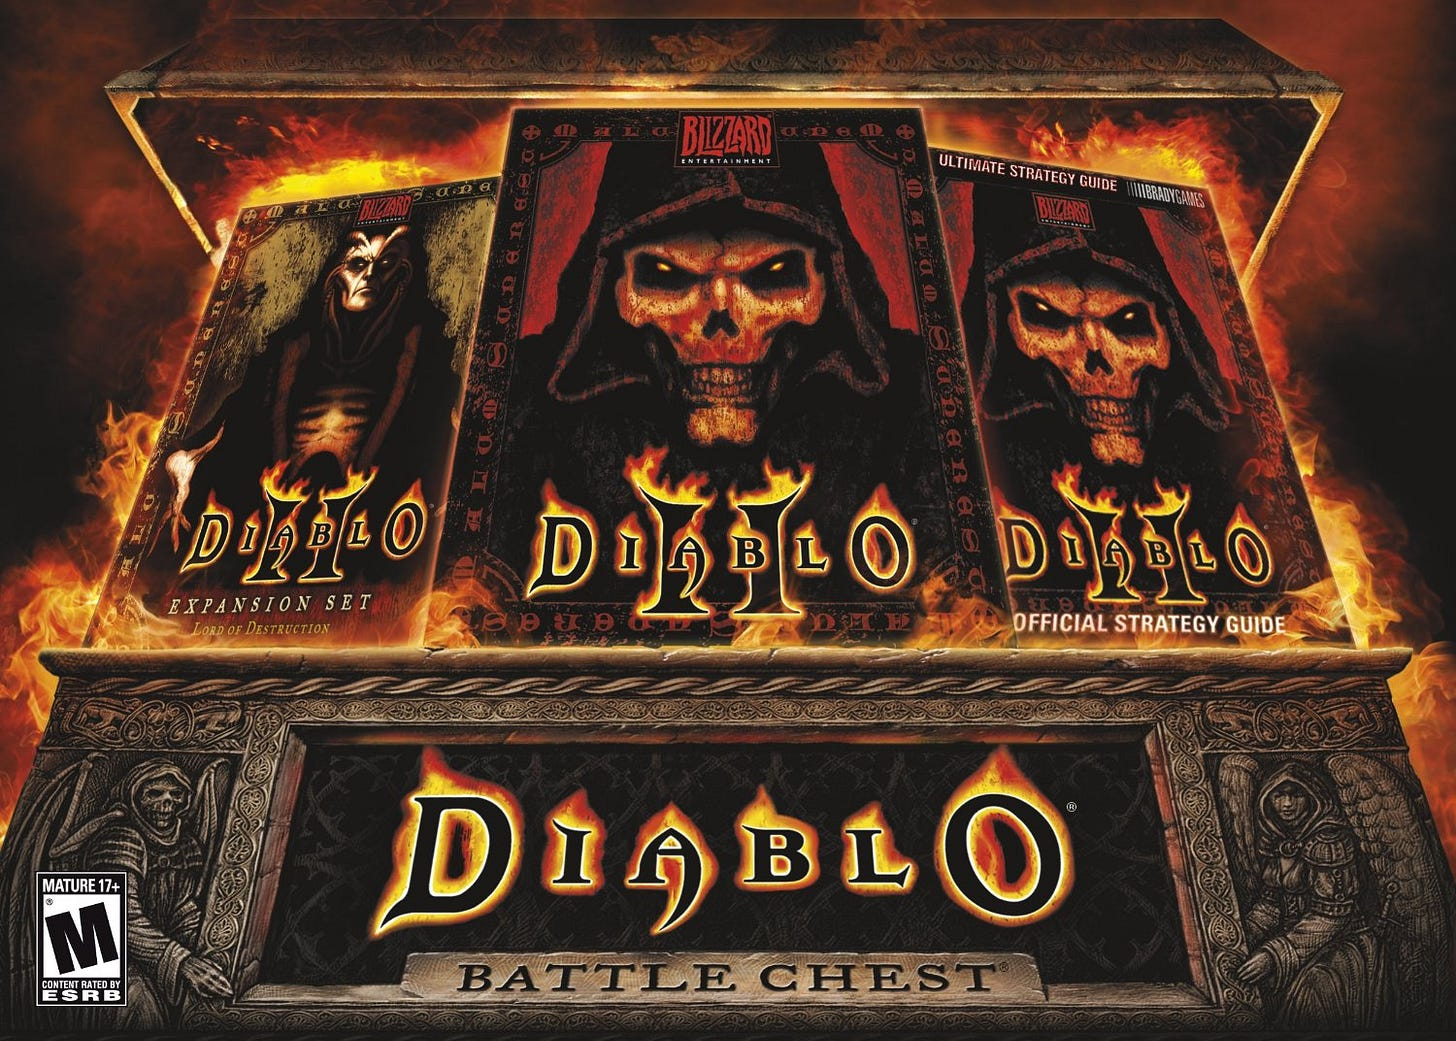 diablo-ii-battle-chest-box